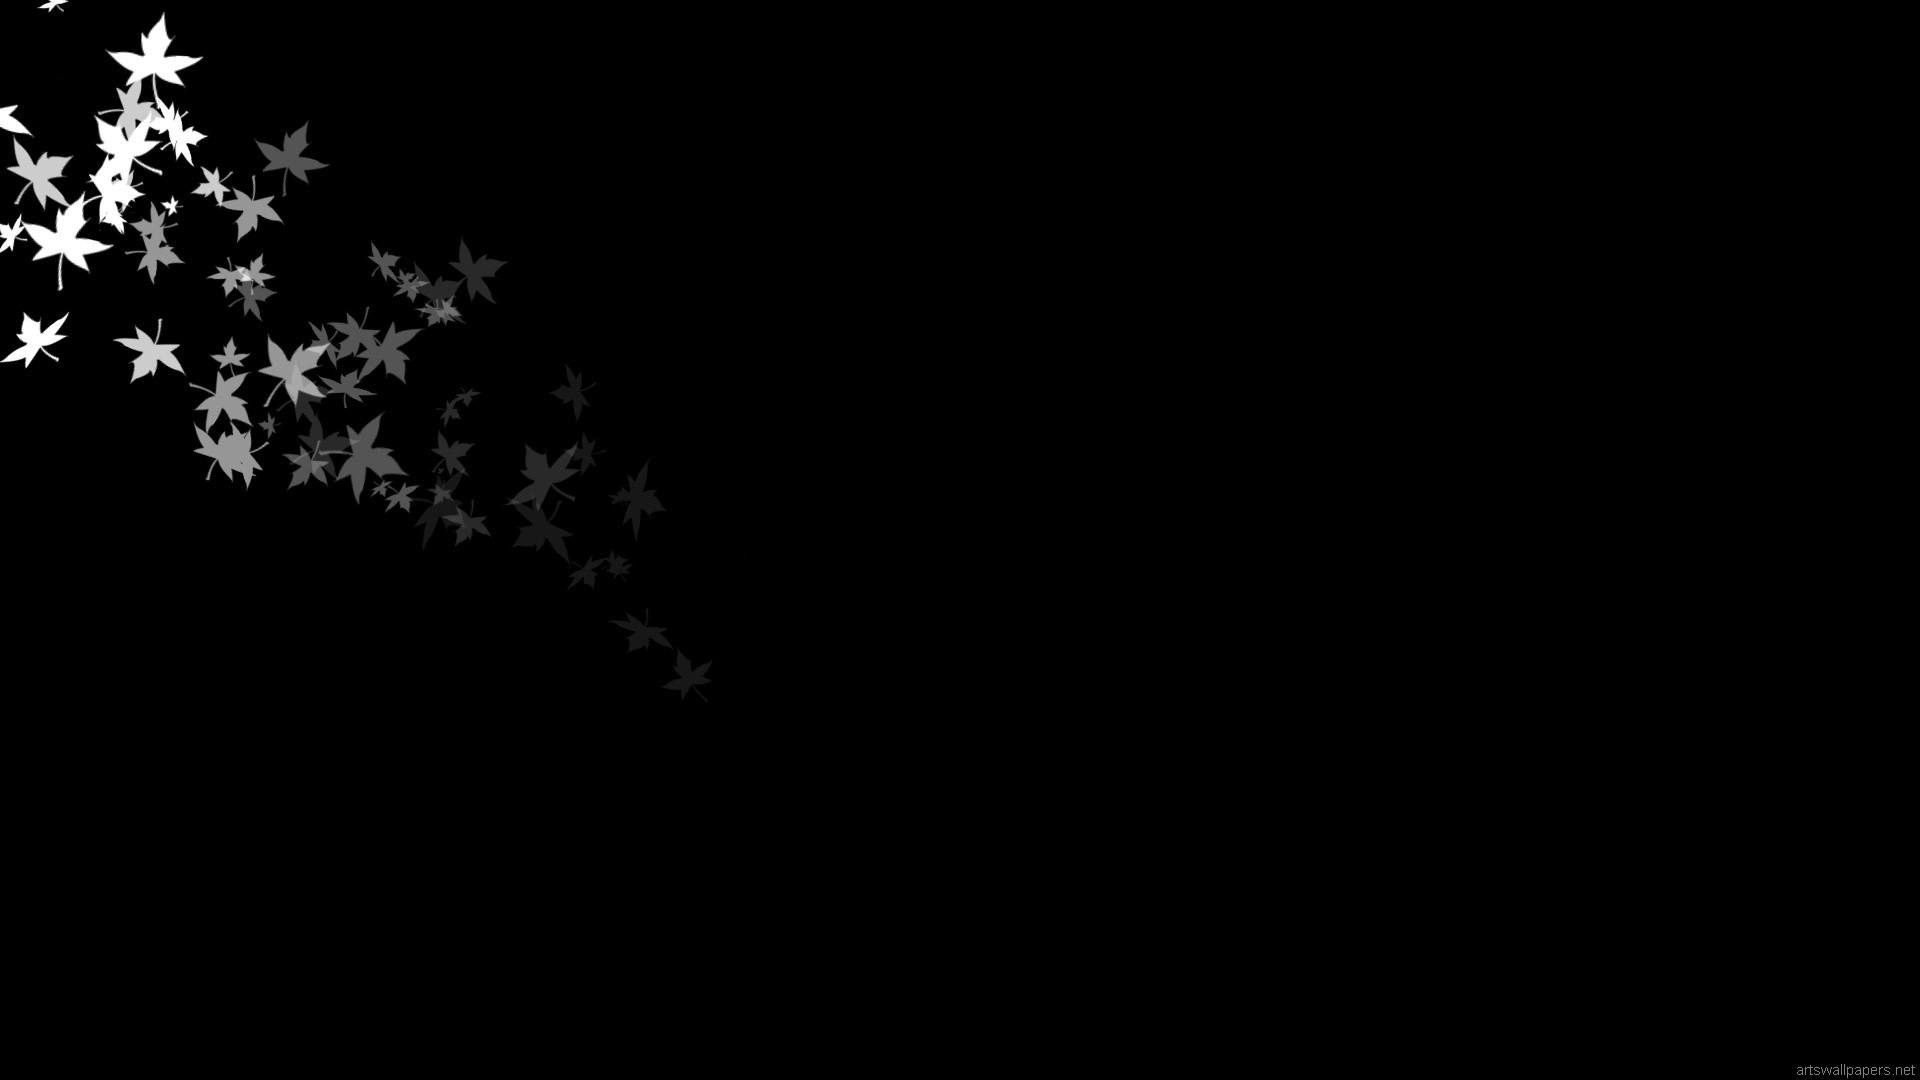 Dark Wallpaper Hd Download Free Amazing Full Hd Backgrounds